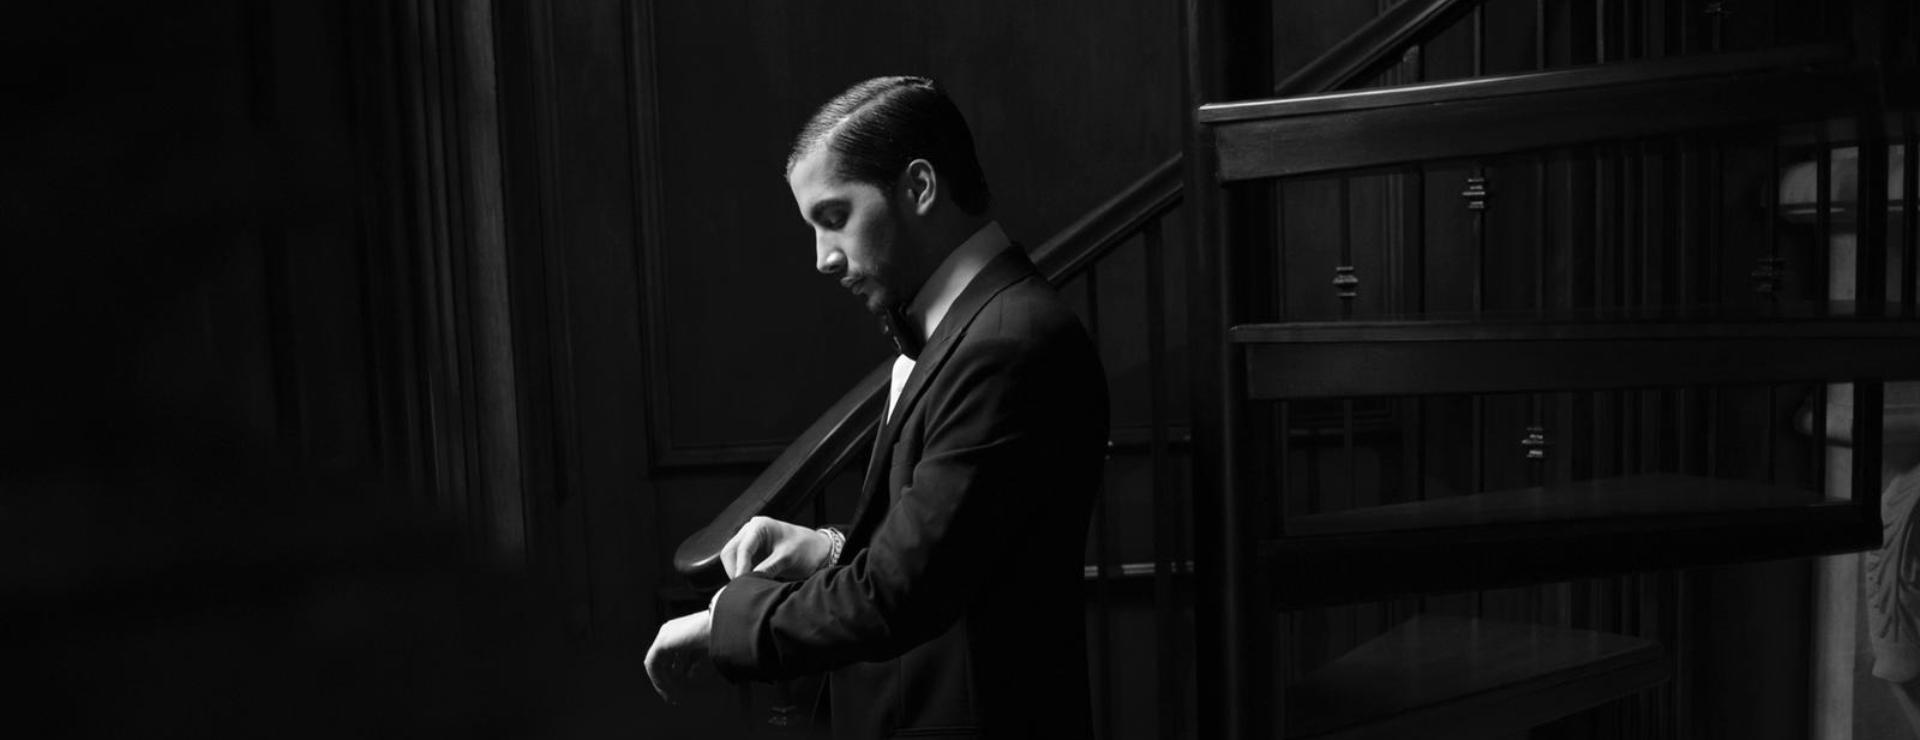 Roberto Rincón, mastermind of Covet NYC